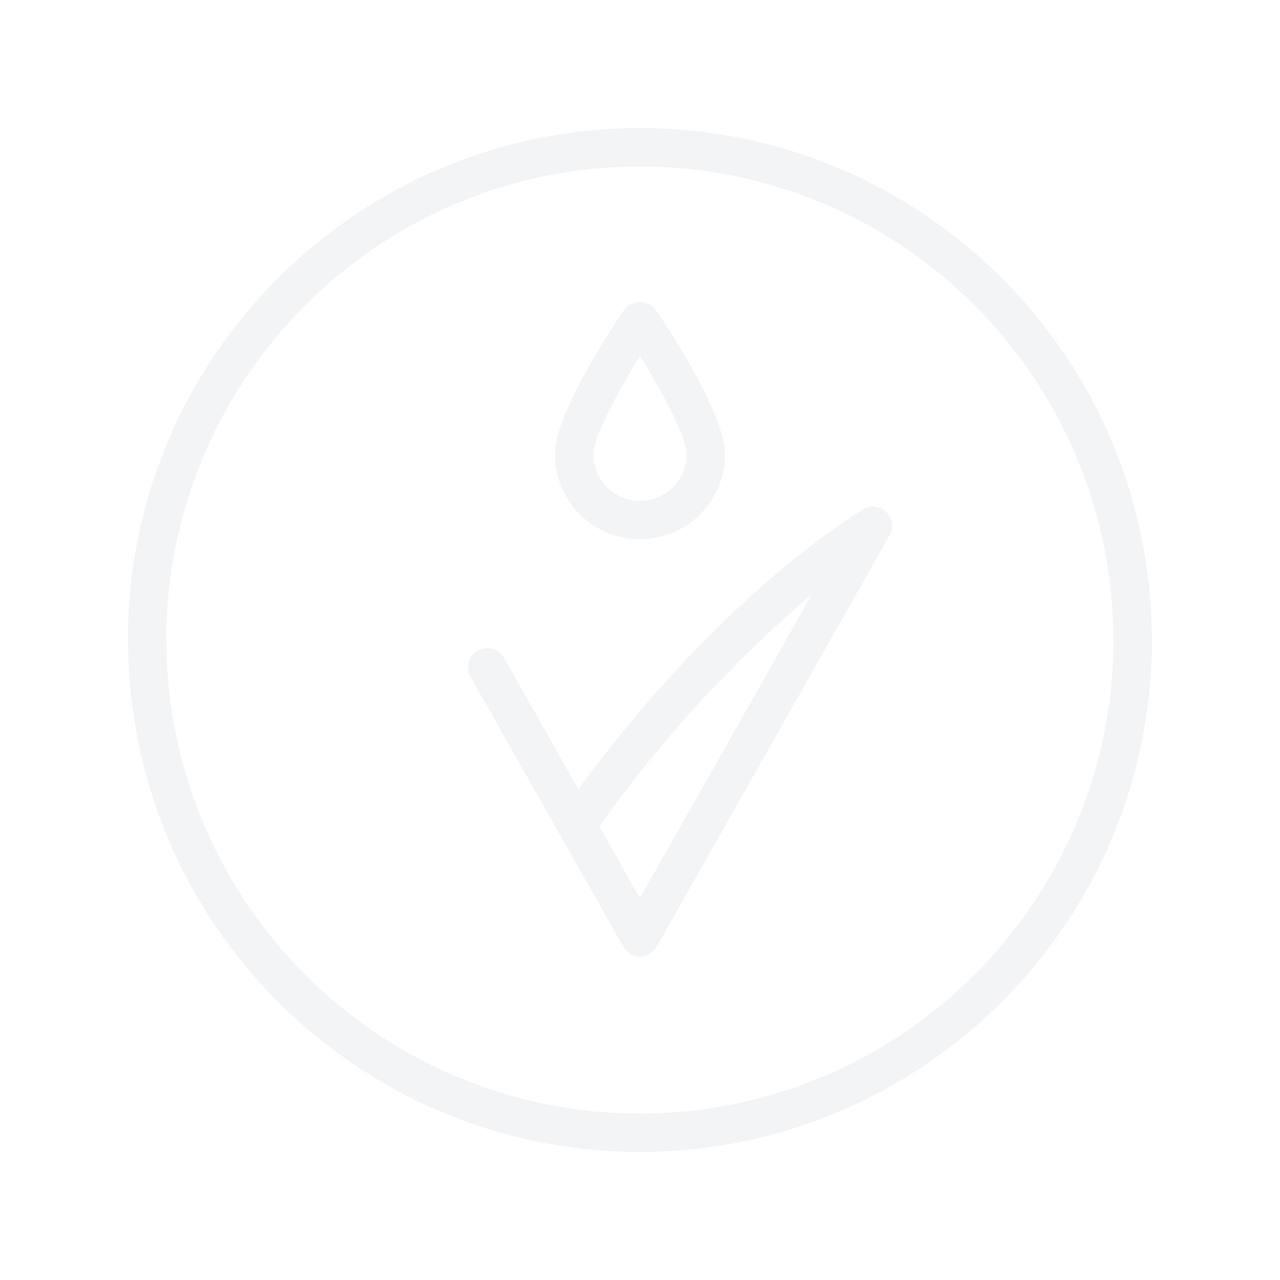 Dior 5 Couleurs Designer Professional Eye Palette 5.7g